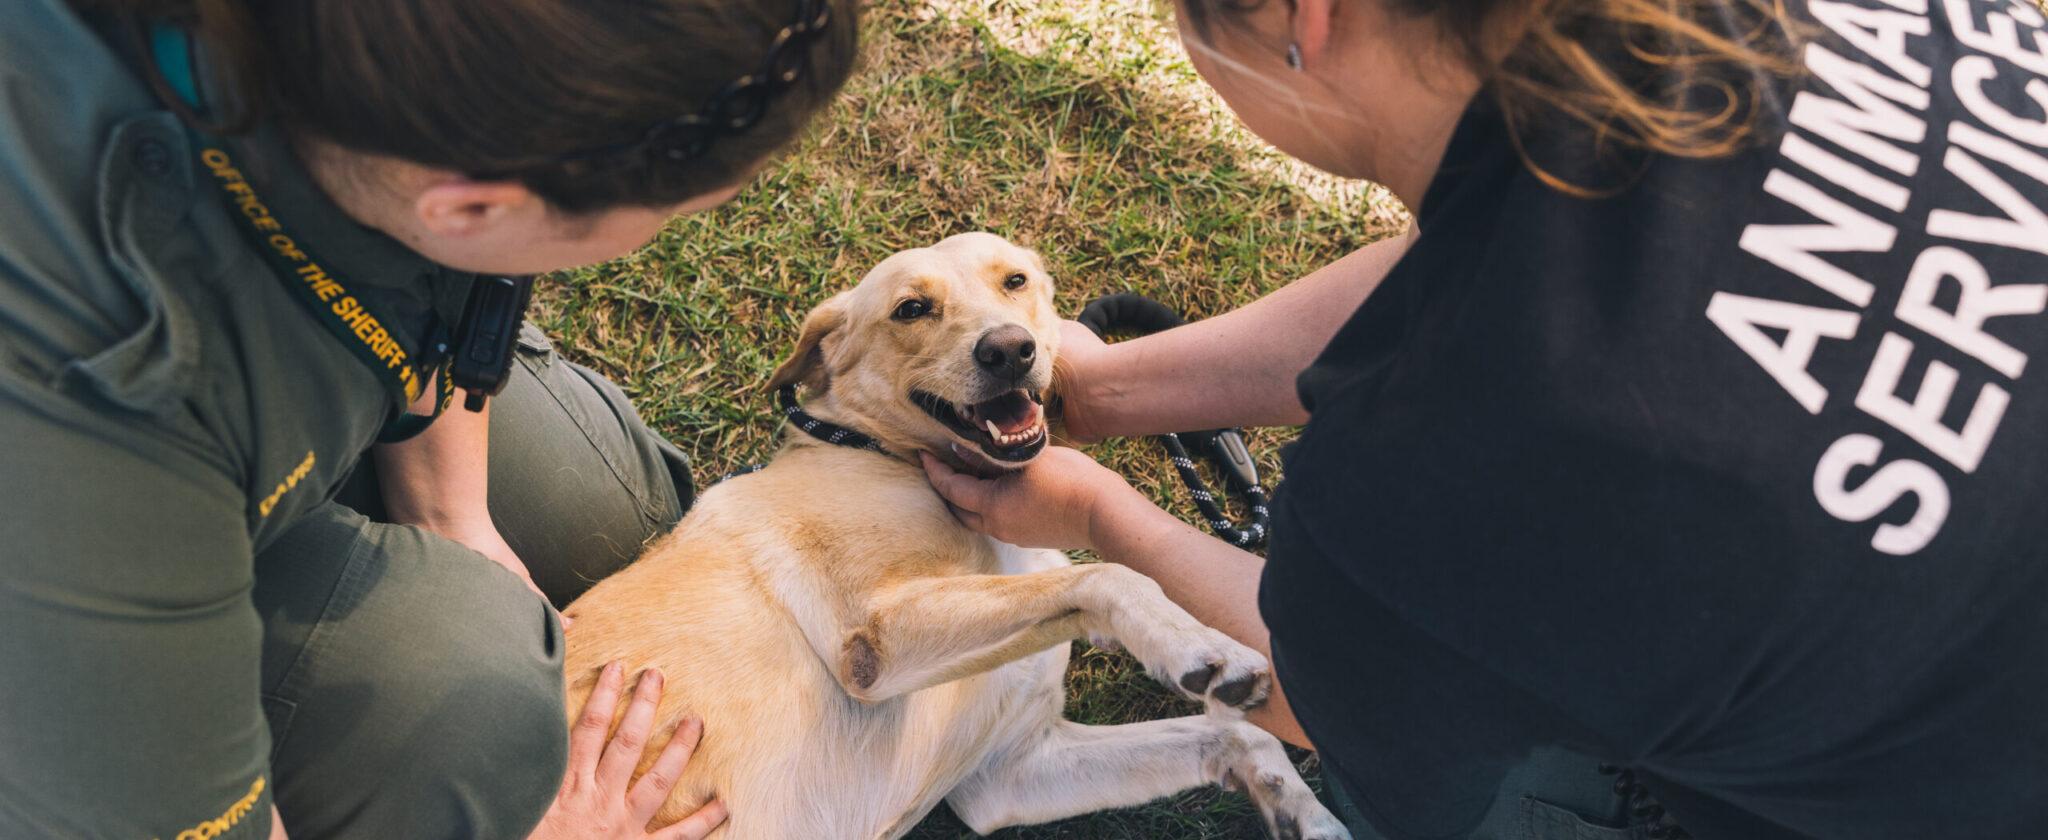 Two women petting a yellow Labrador retriever dog